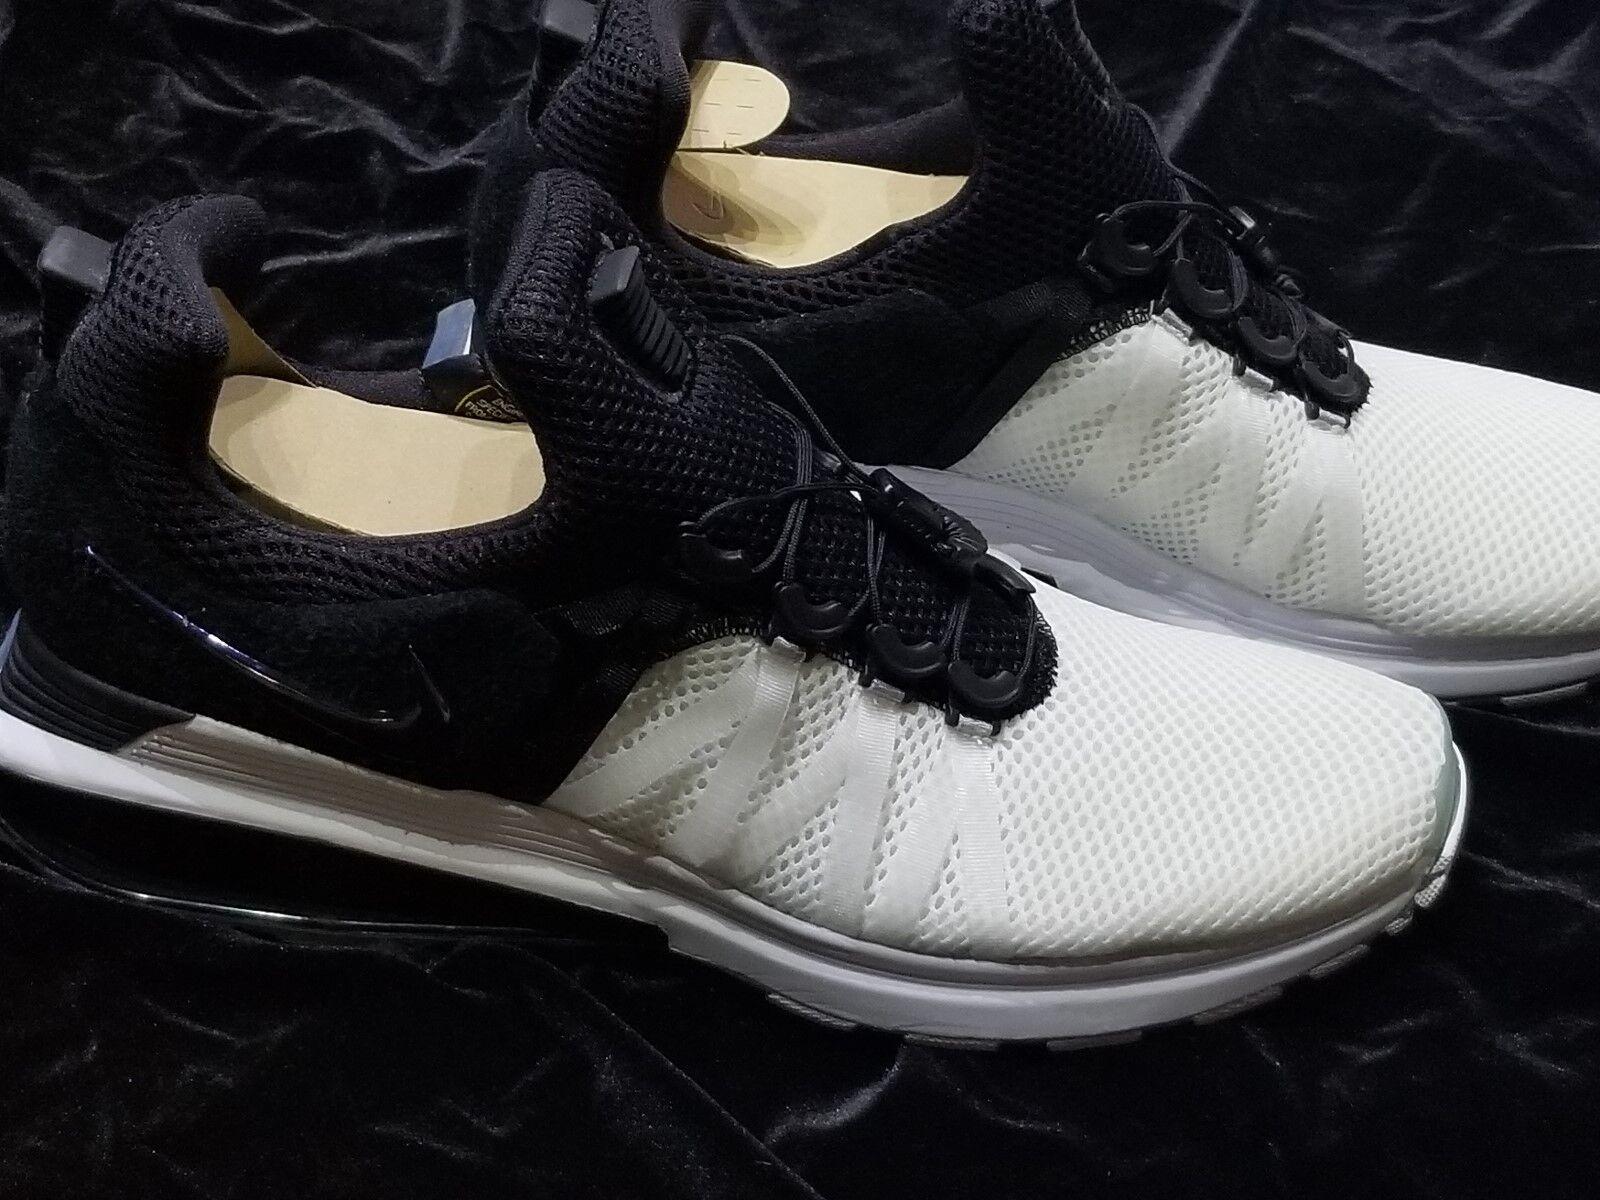 New MENS NIKE  SHOX  GRAVITY BLACK  WHITE  Size 13